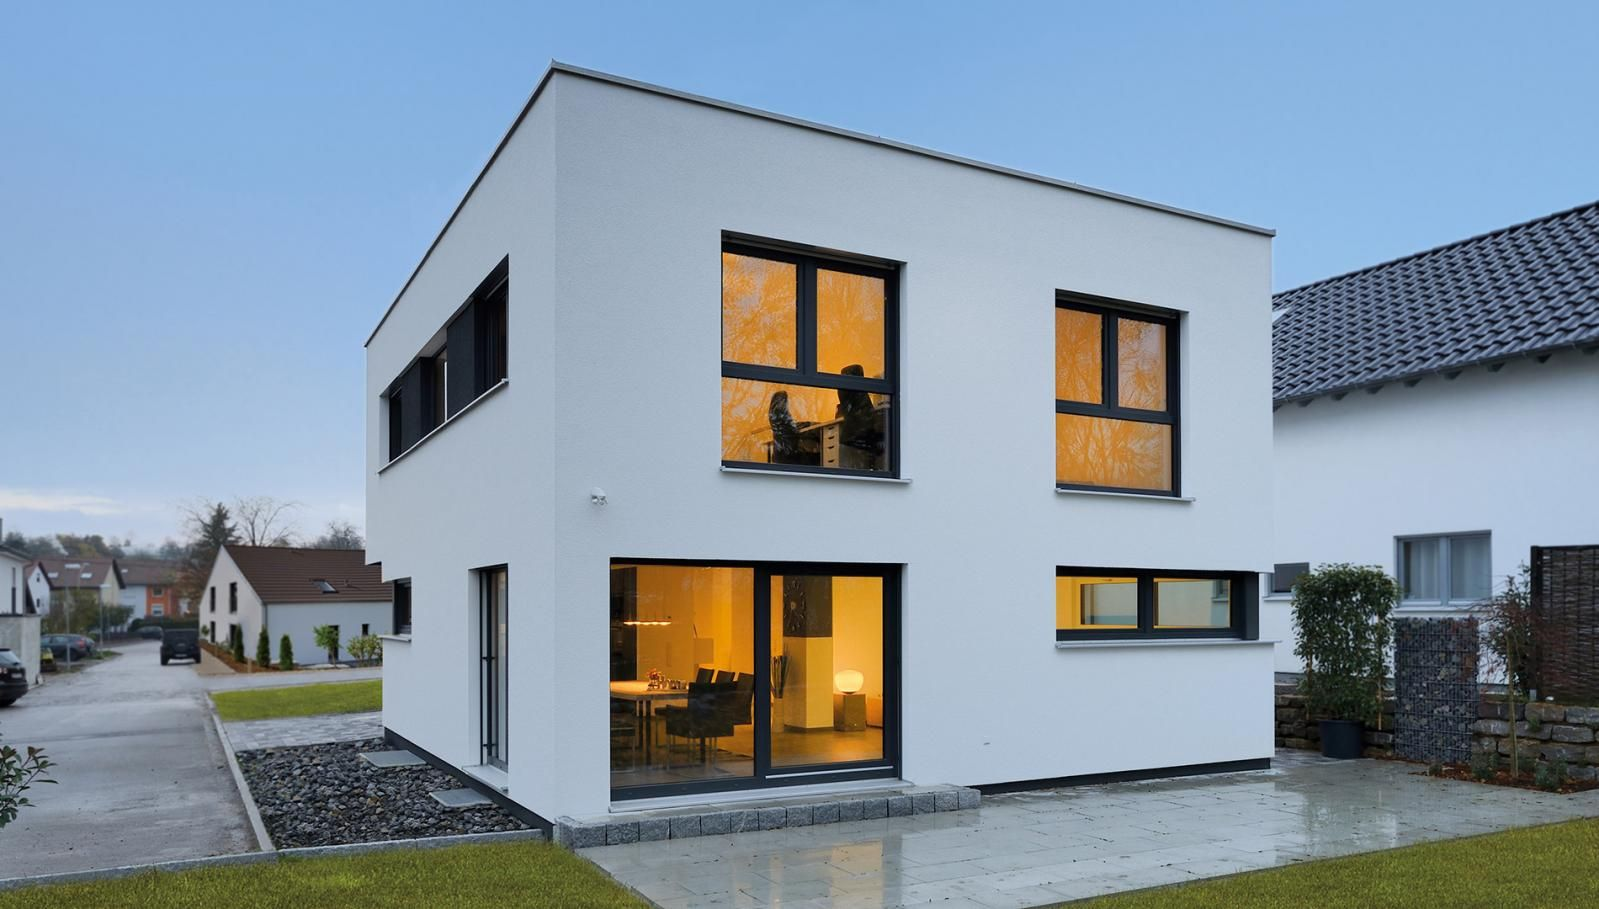 Weiss Fertighaus klar rational zeitlos bauhaus architektur fertighaus weiss